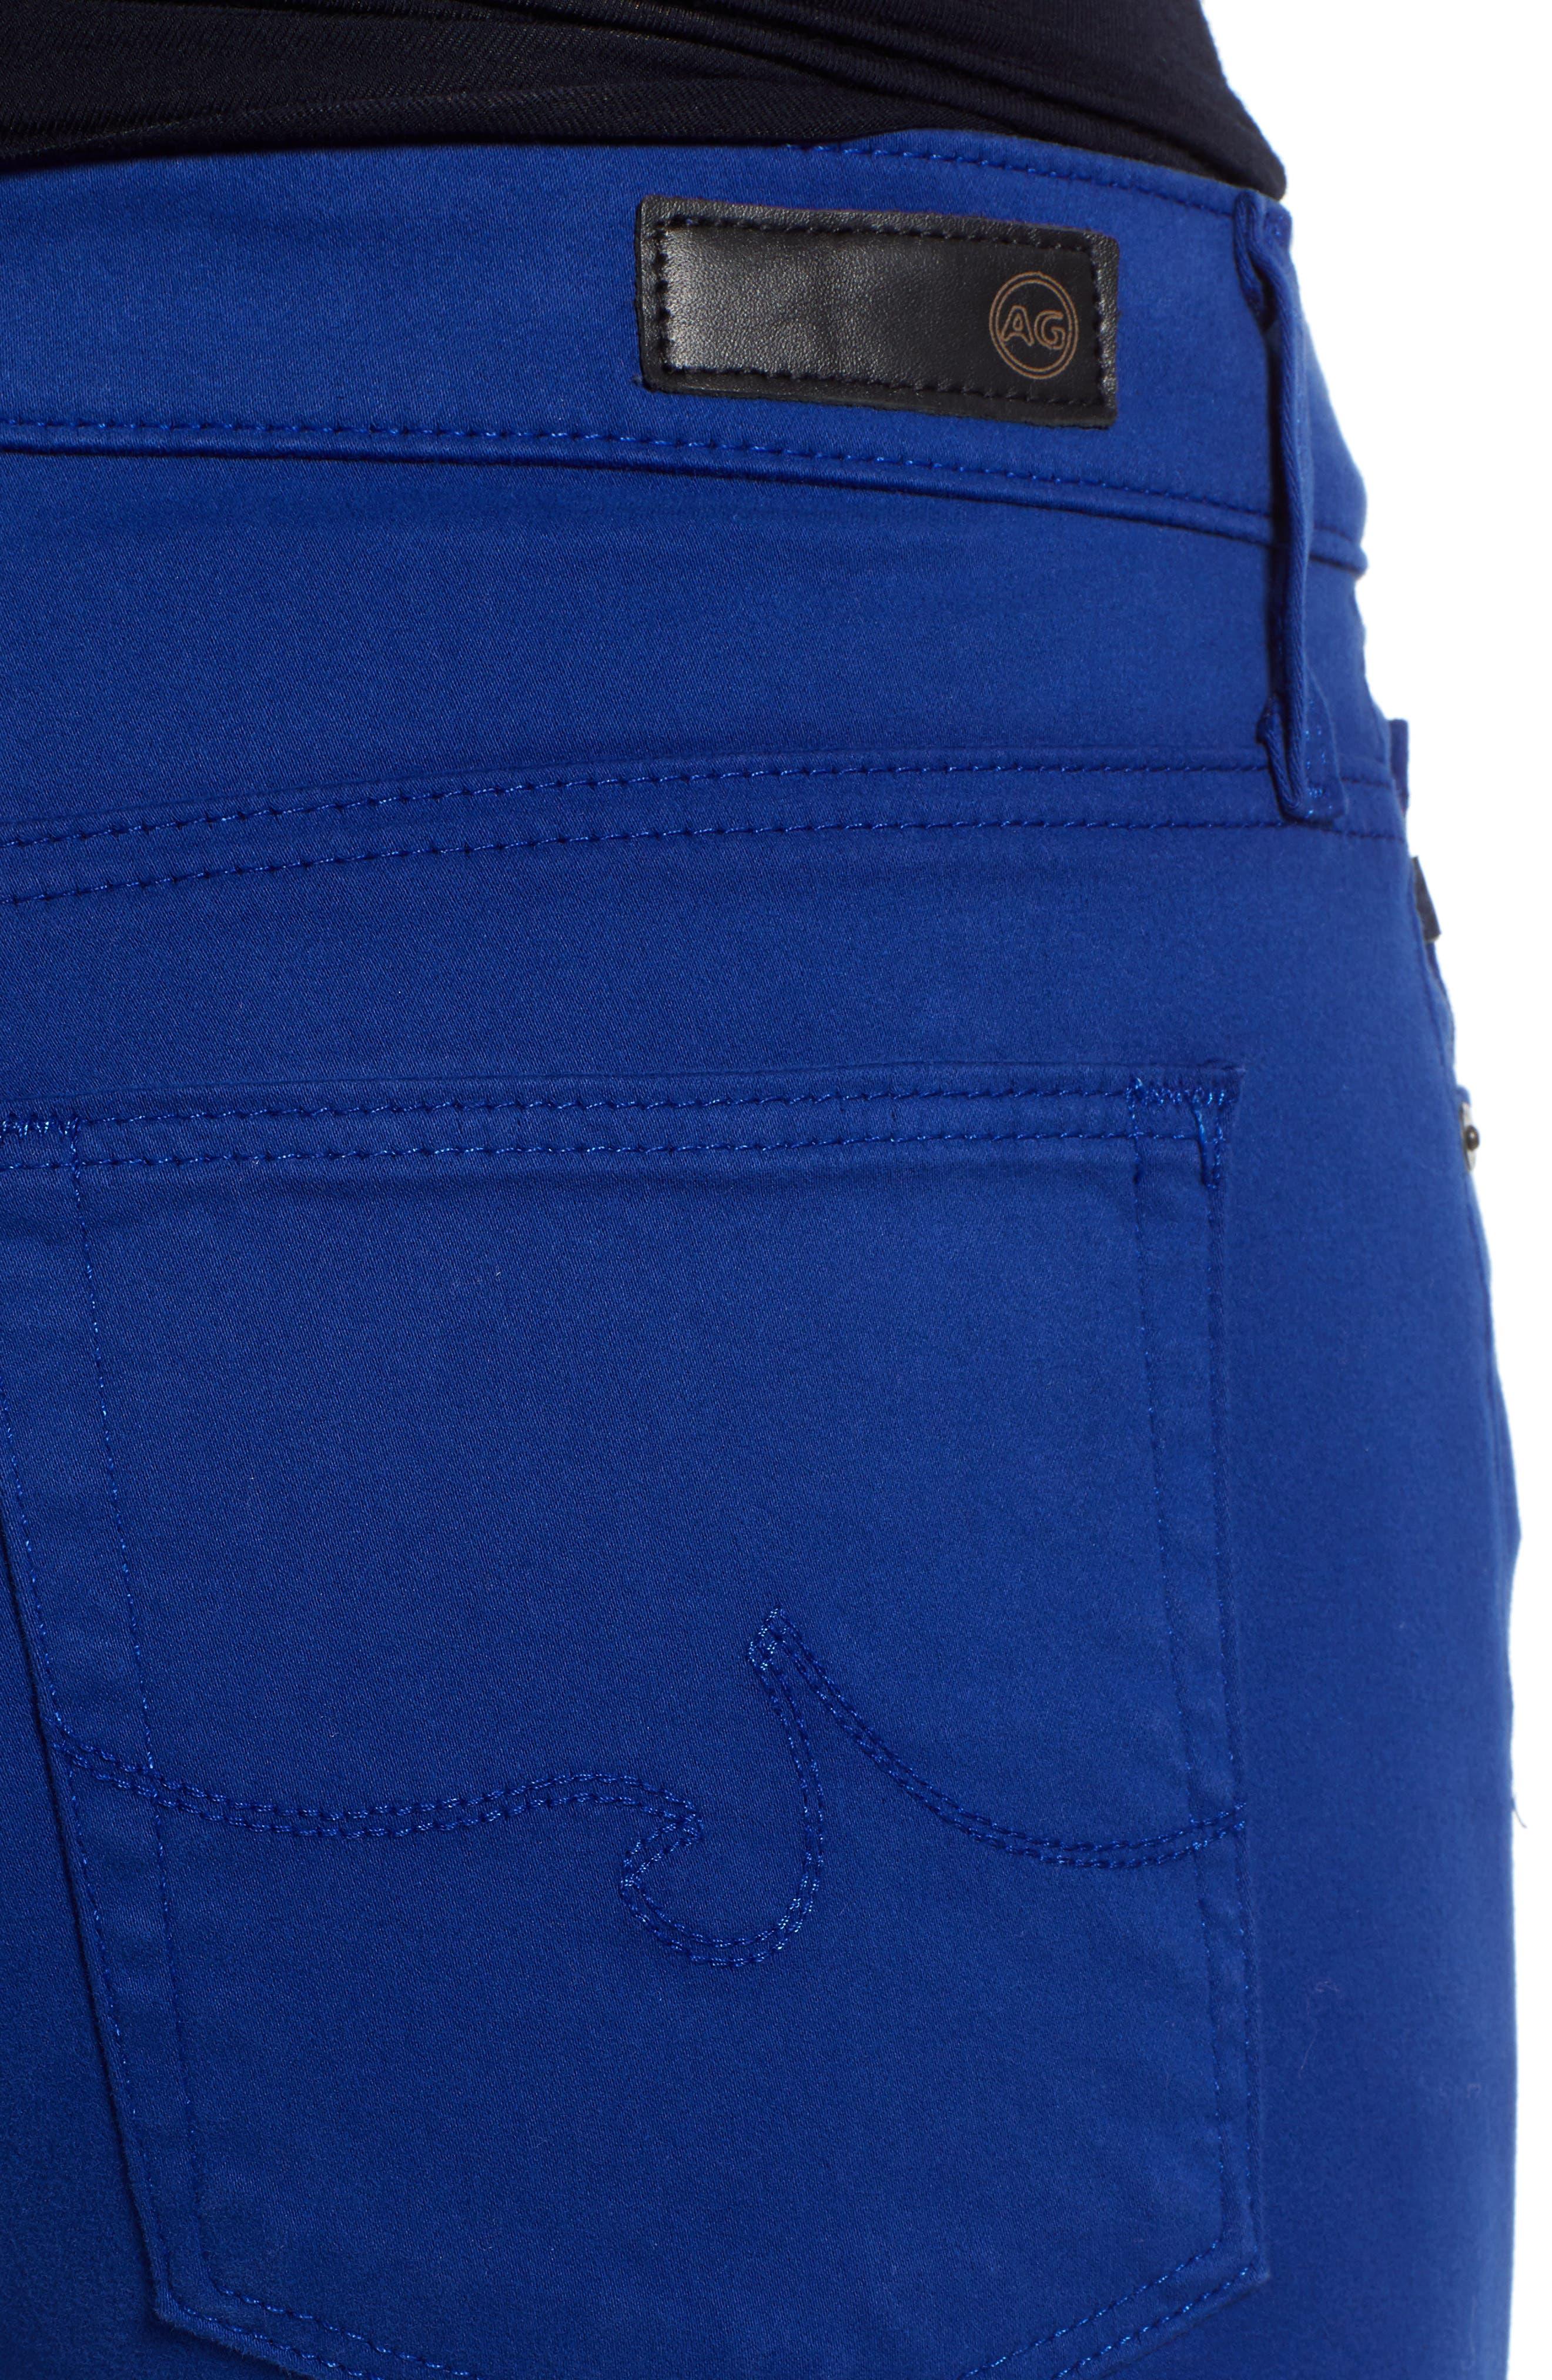 Farrah High Waist Ankle Skinny Jeans,                             Alternate thumbnail 4, color,                             EGYPTIAN BLUE